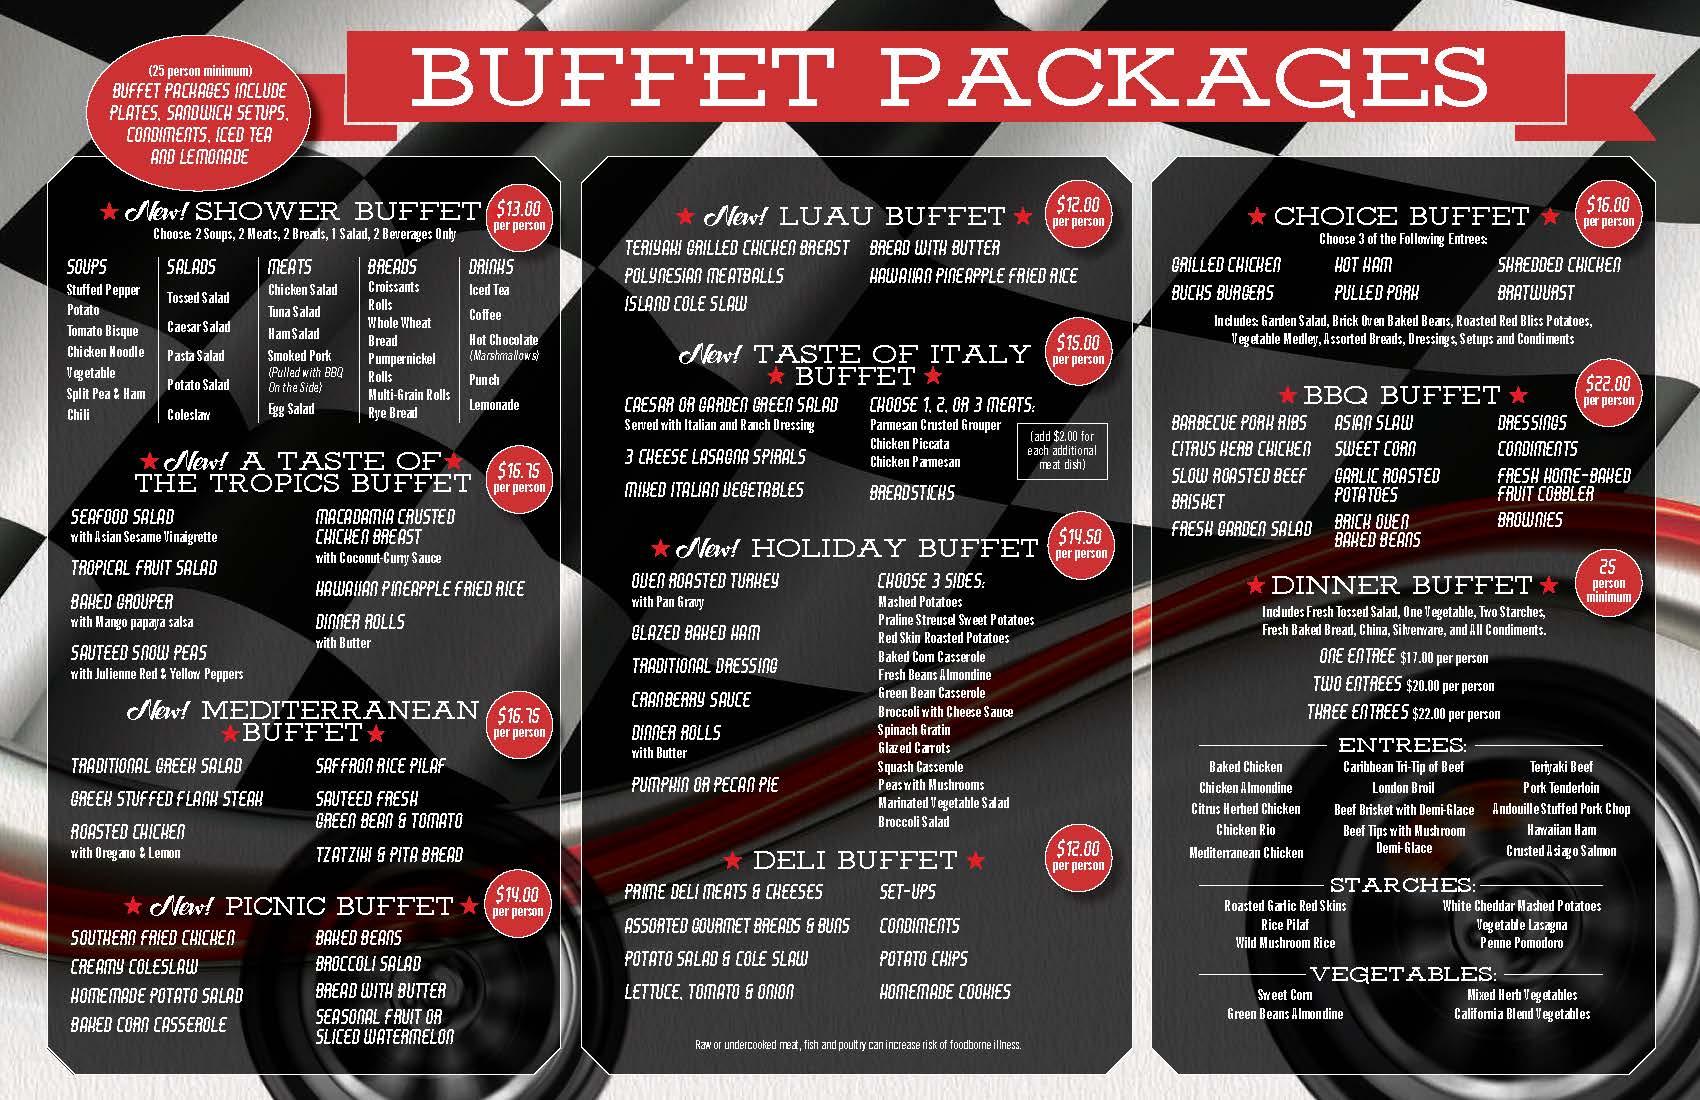 Bucks Banquet 10304 c14452_LR_Page_2.jpg